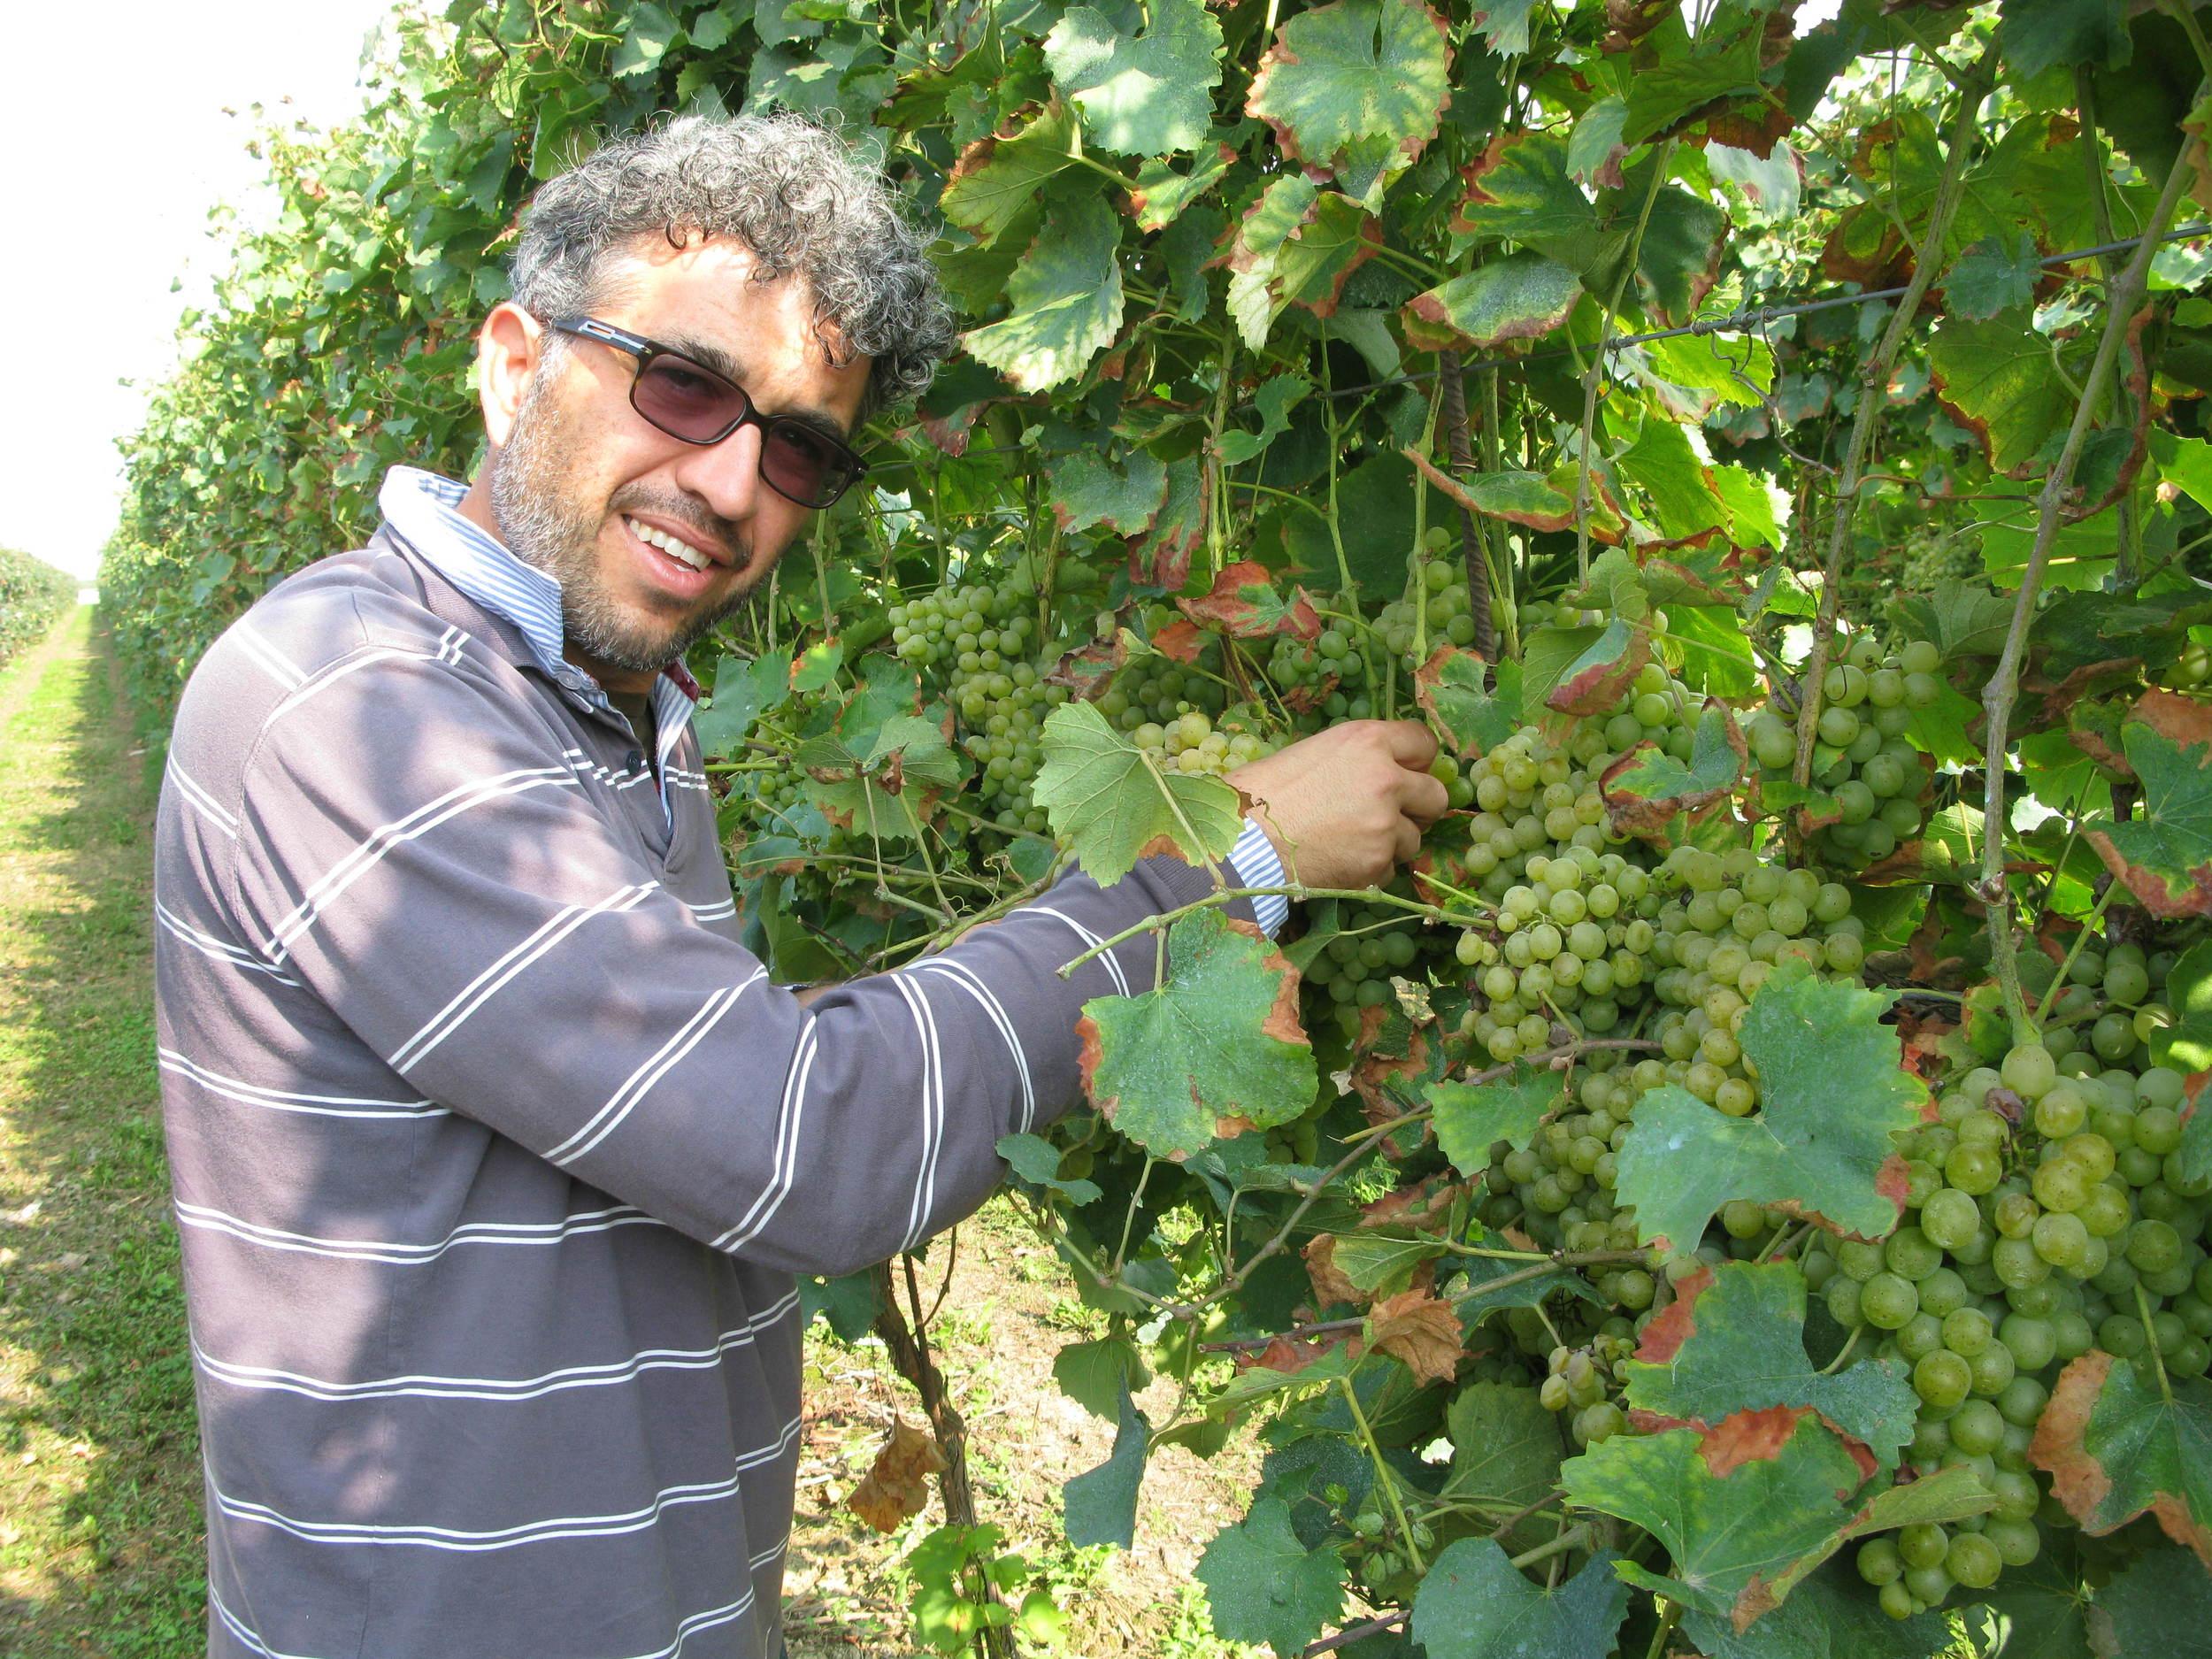 Massimo Randi checks the grapes